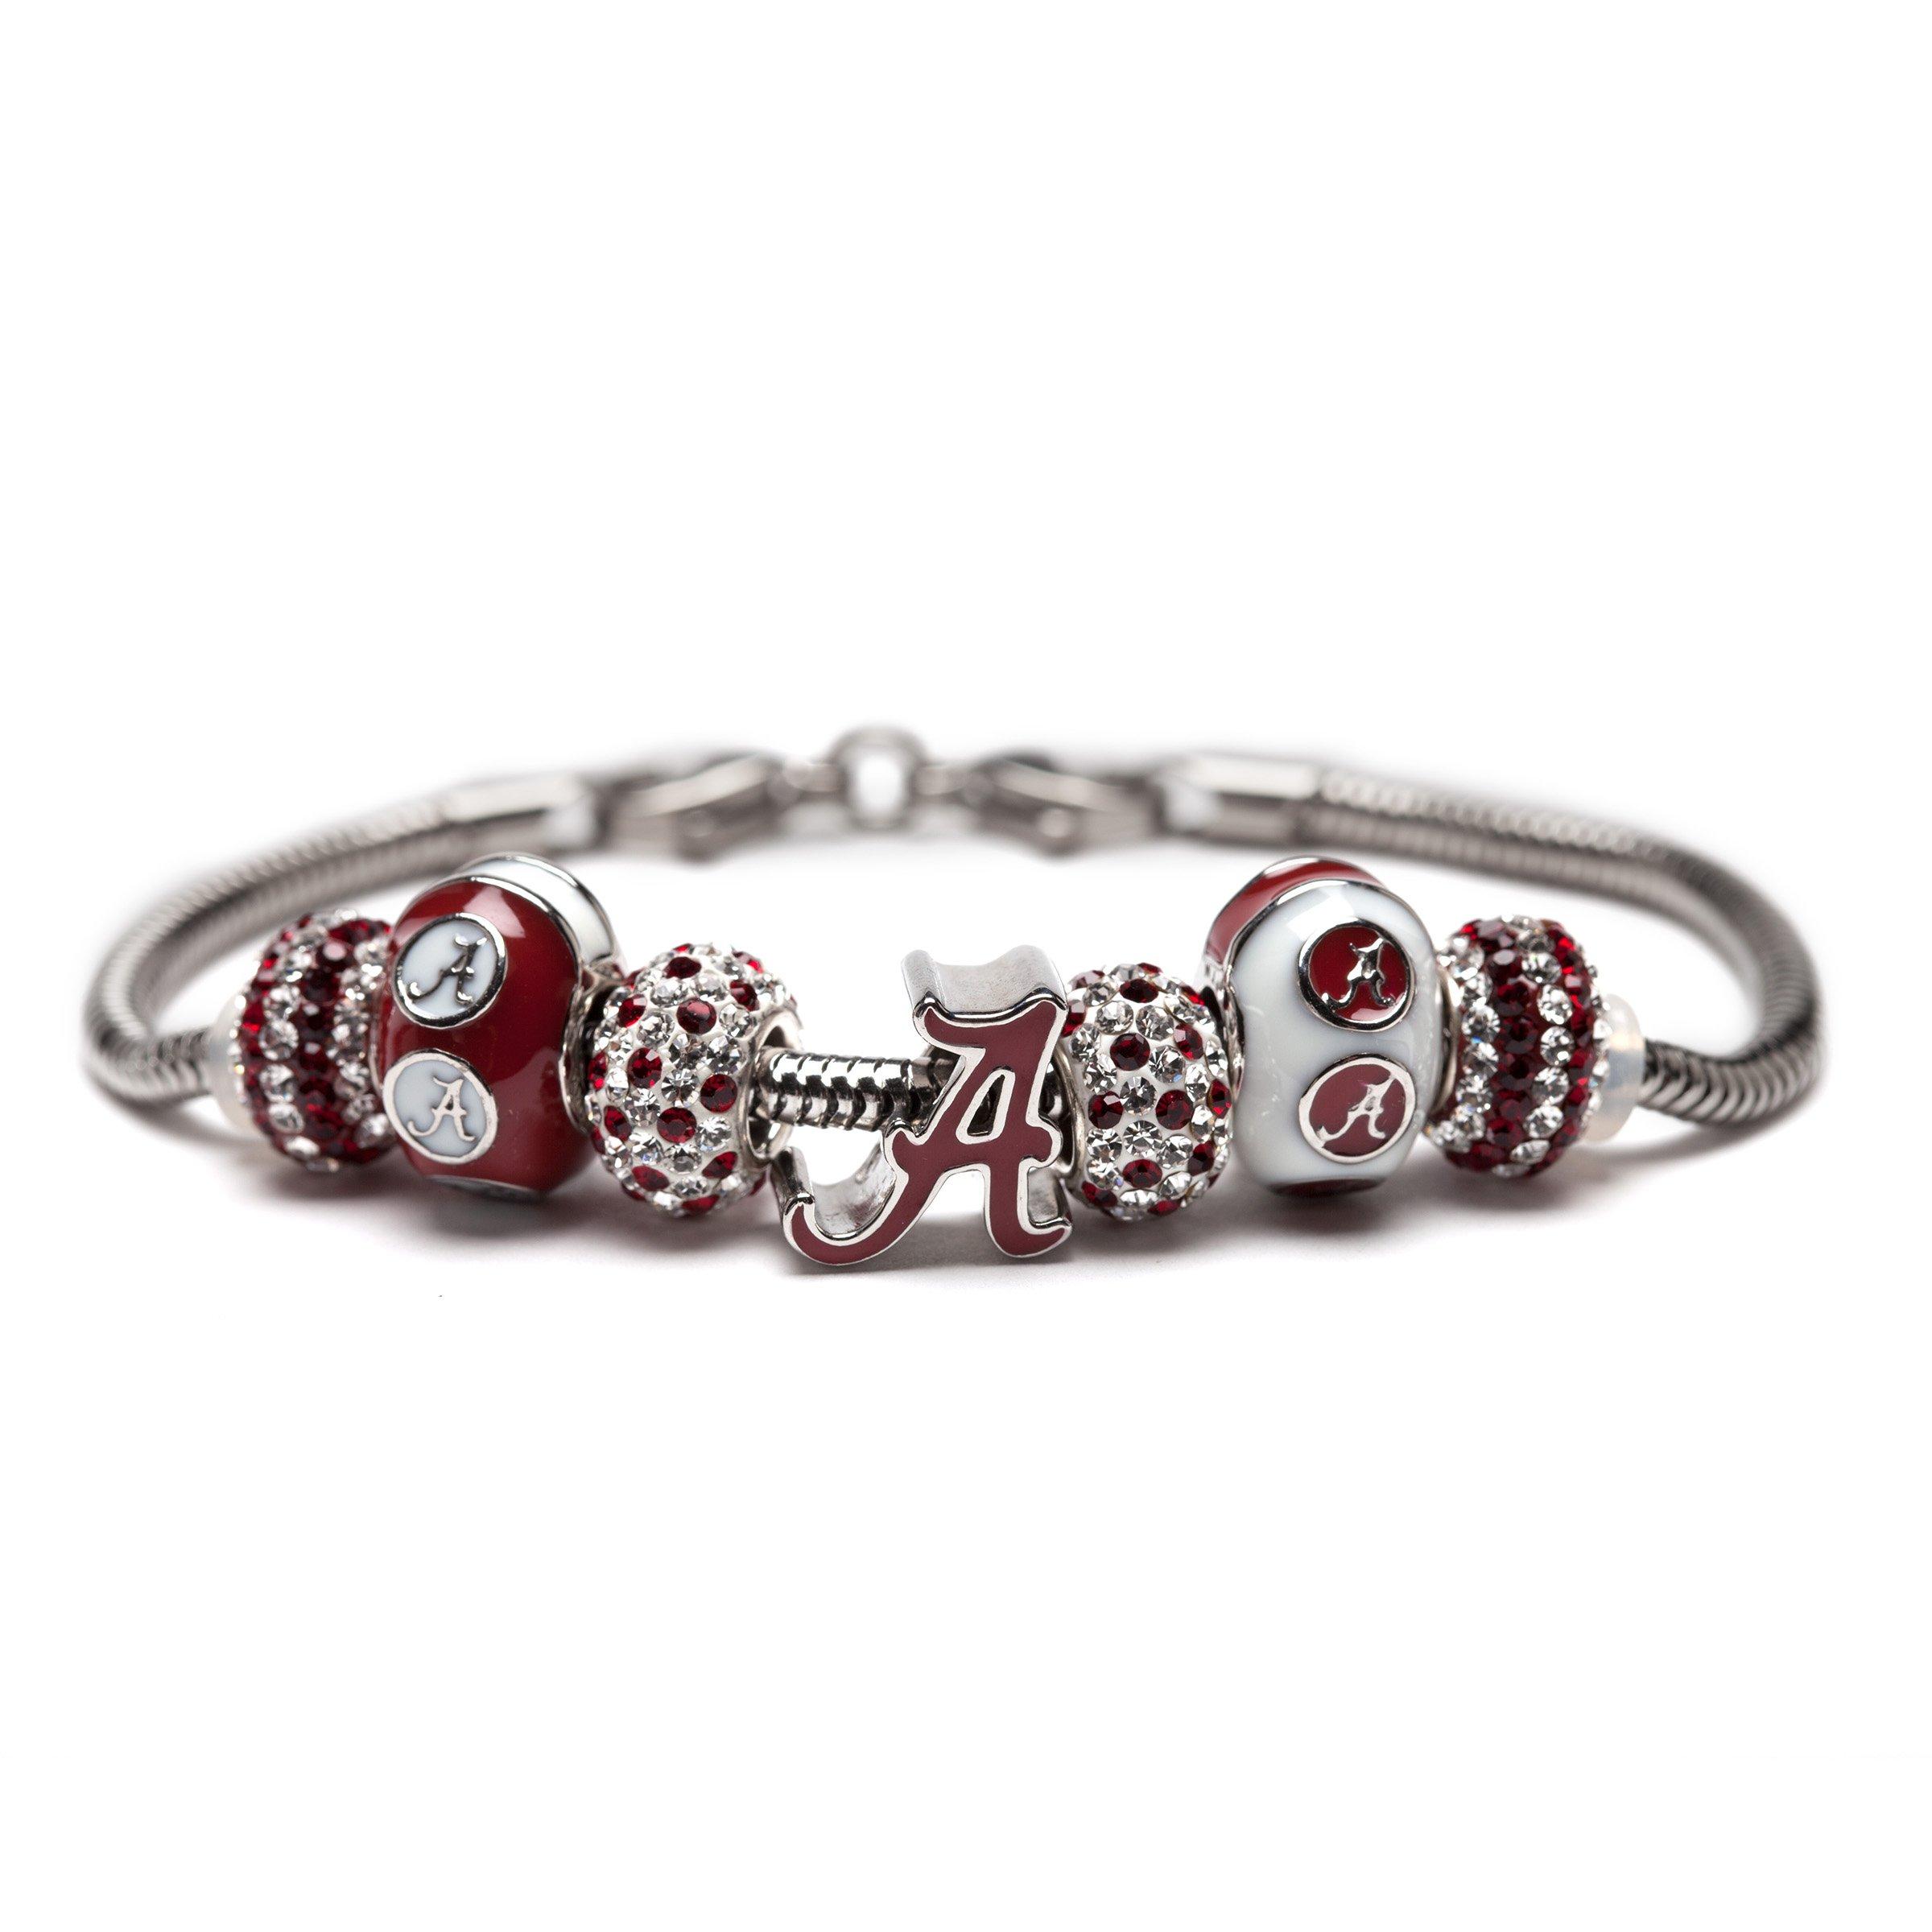 University of Alabama Charm Bracelet | Crimson Tide Gifts | Stainless Steel Alabama Jewelry | Alabama Logo Charm Bracelet by Stone Armory